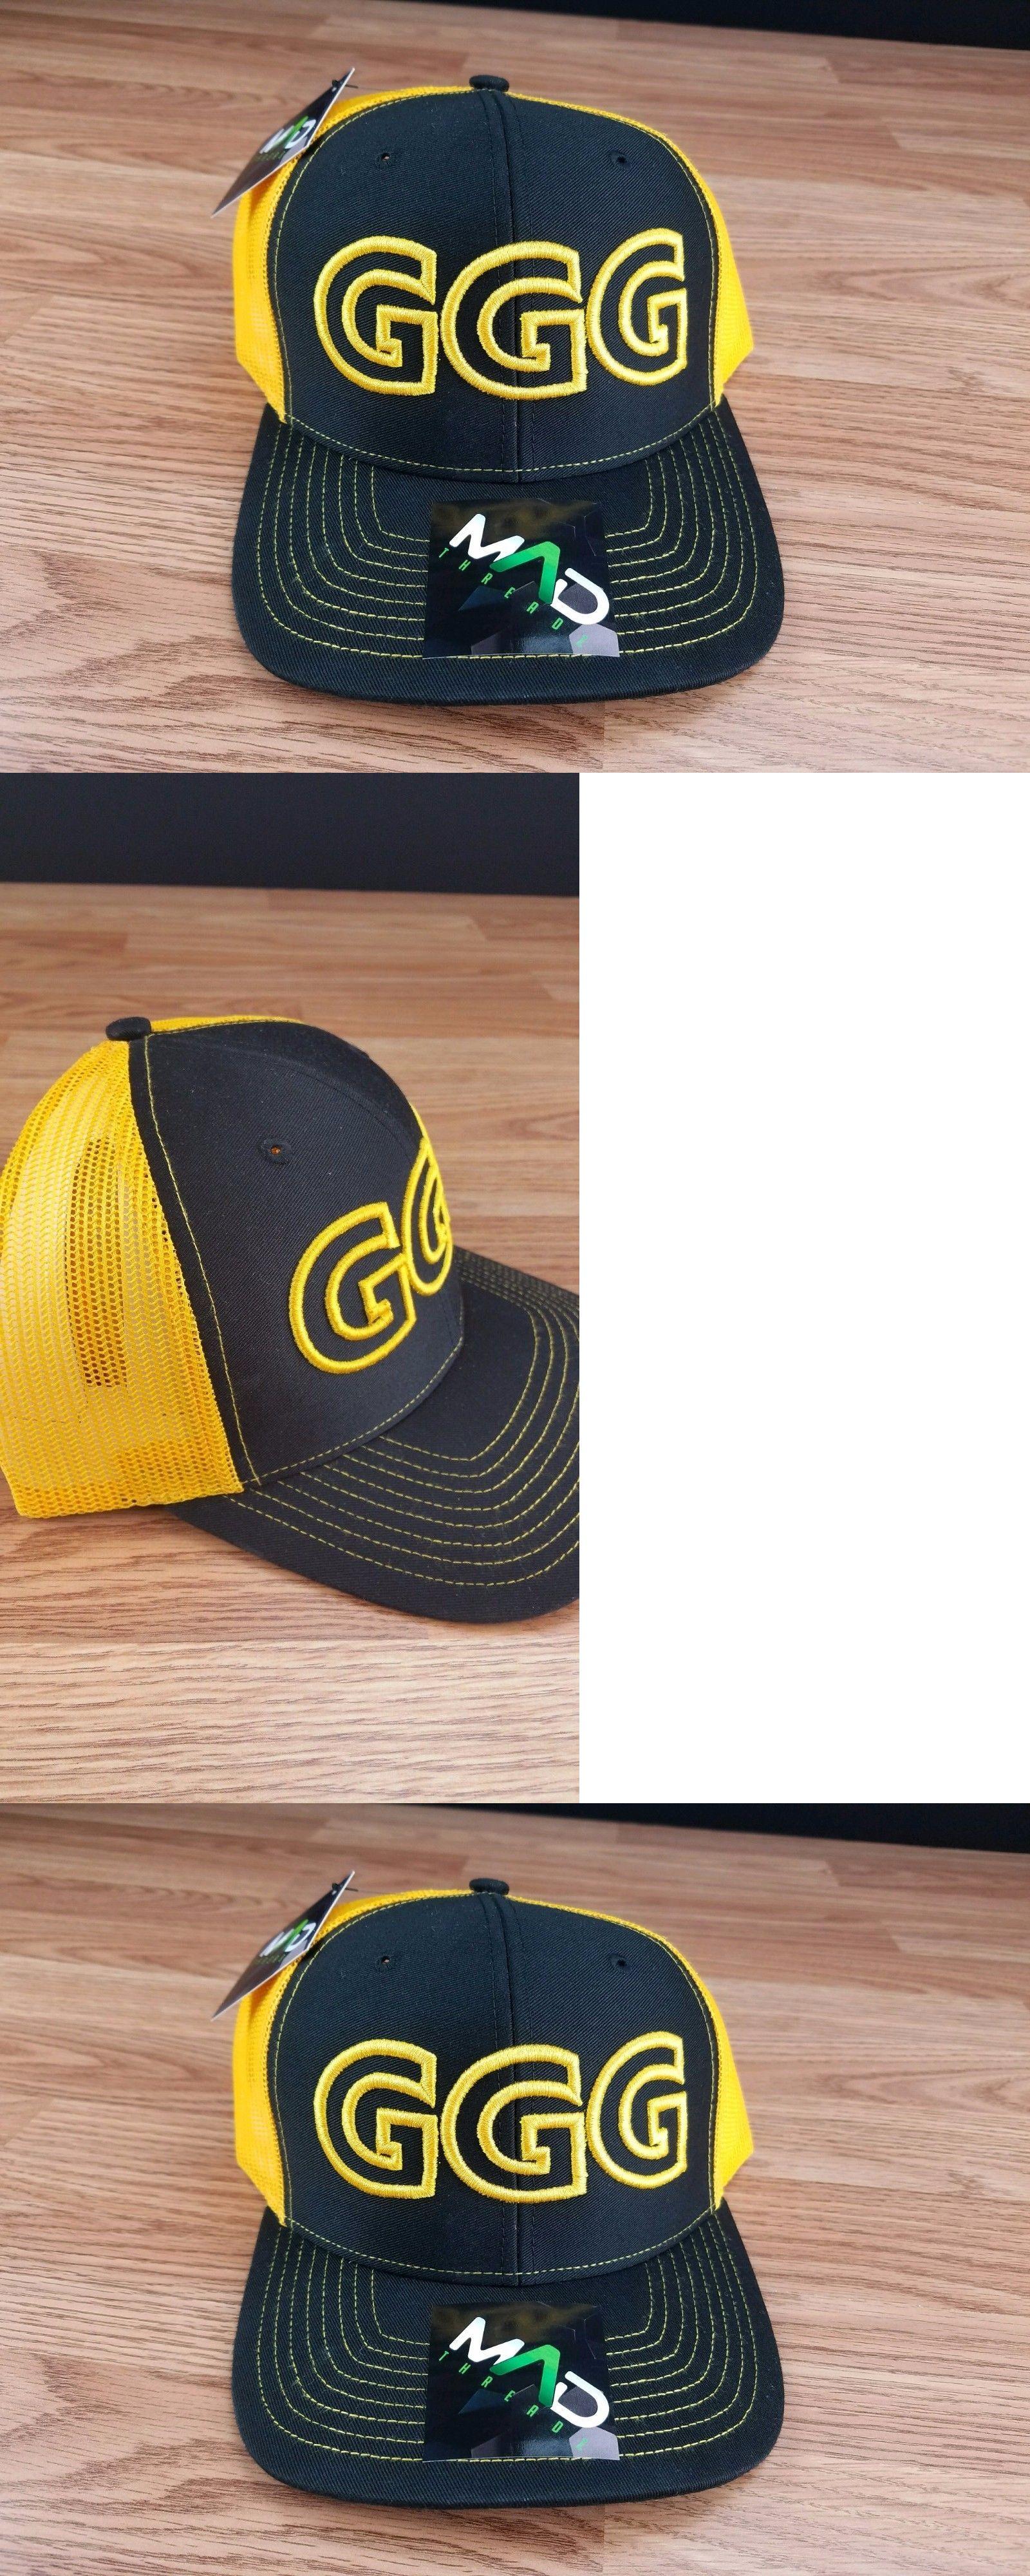 05a054dd7cf033 Headbands and Hats 179769: Ggg Canelo Alvarez Golovkin Boxing Hat Boxer  Champion Snapback Cap Hat